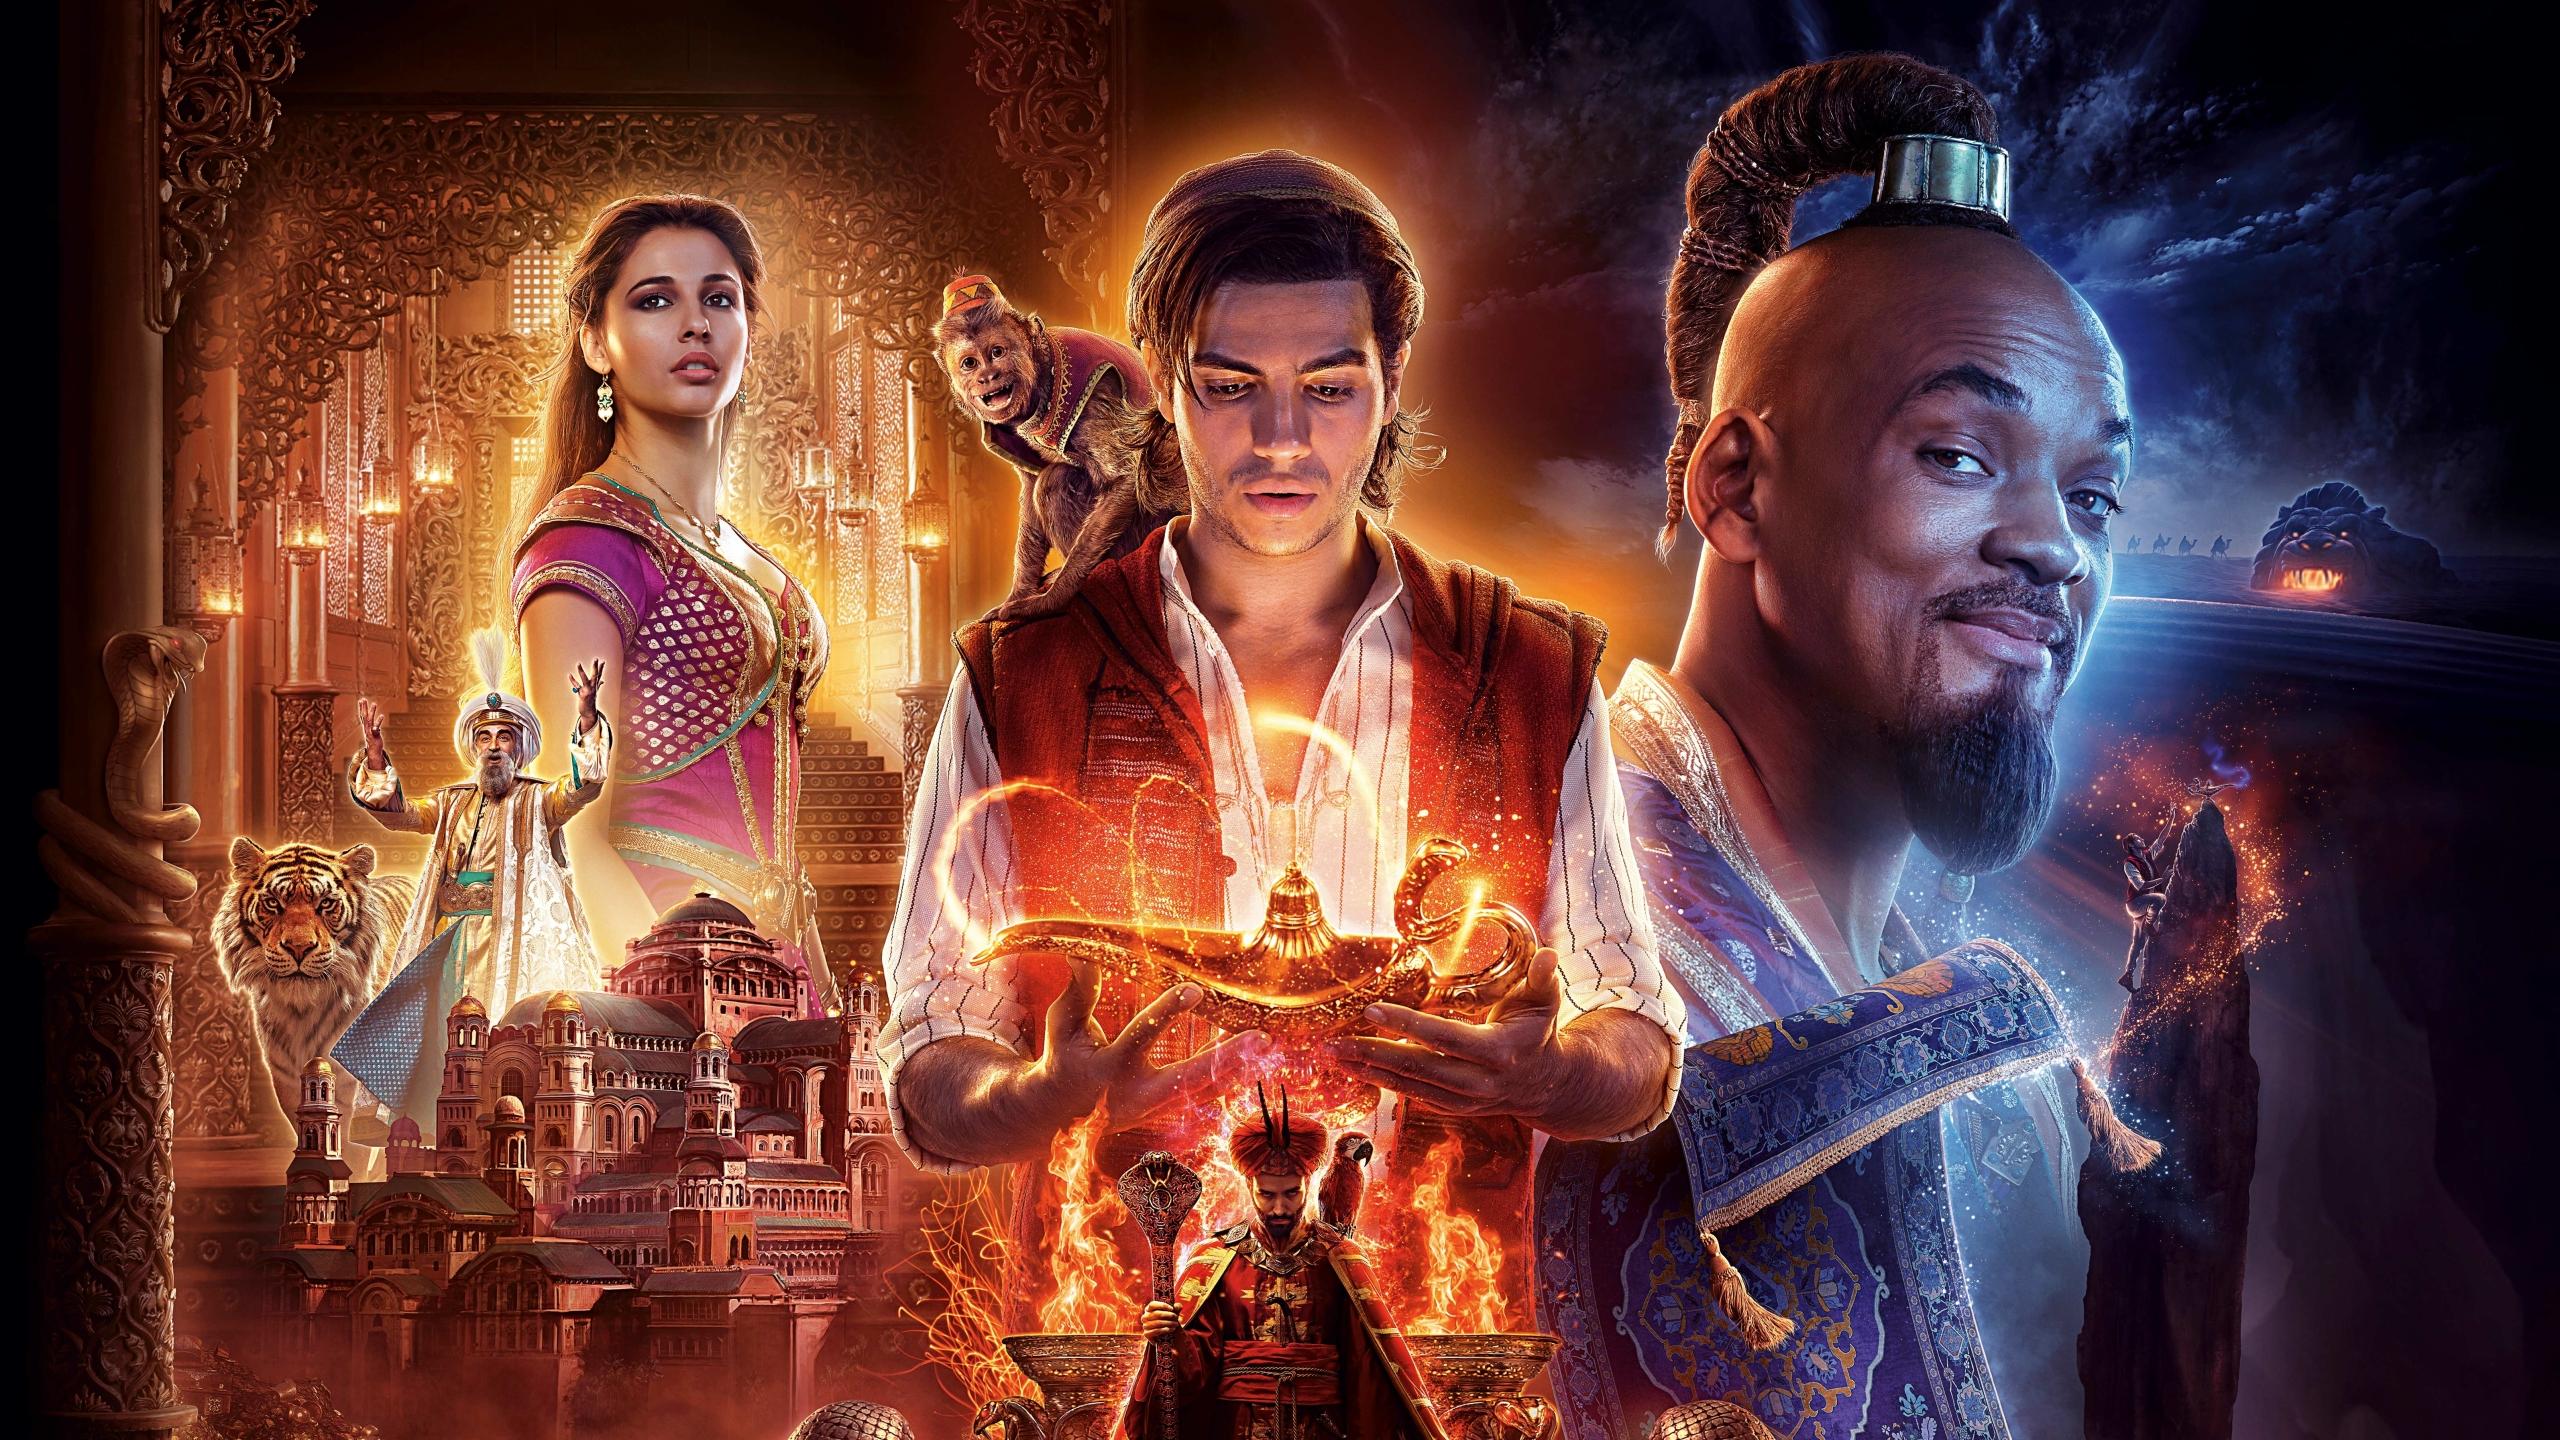 2560x1440 Aladdin 2019 Movie 4K 6K 1440P Resolution ...